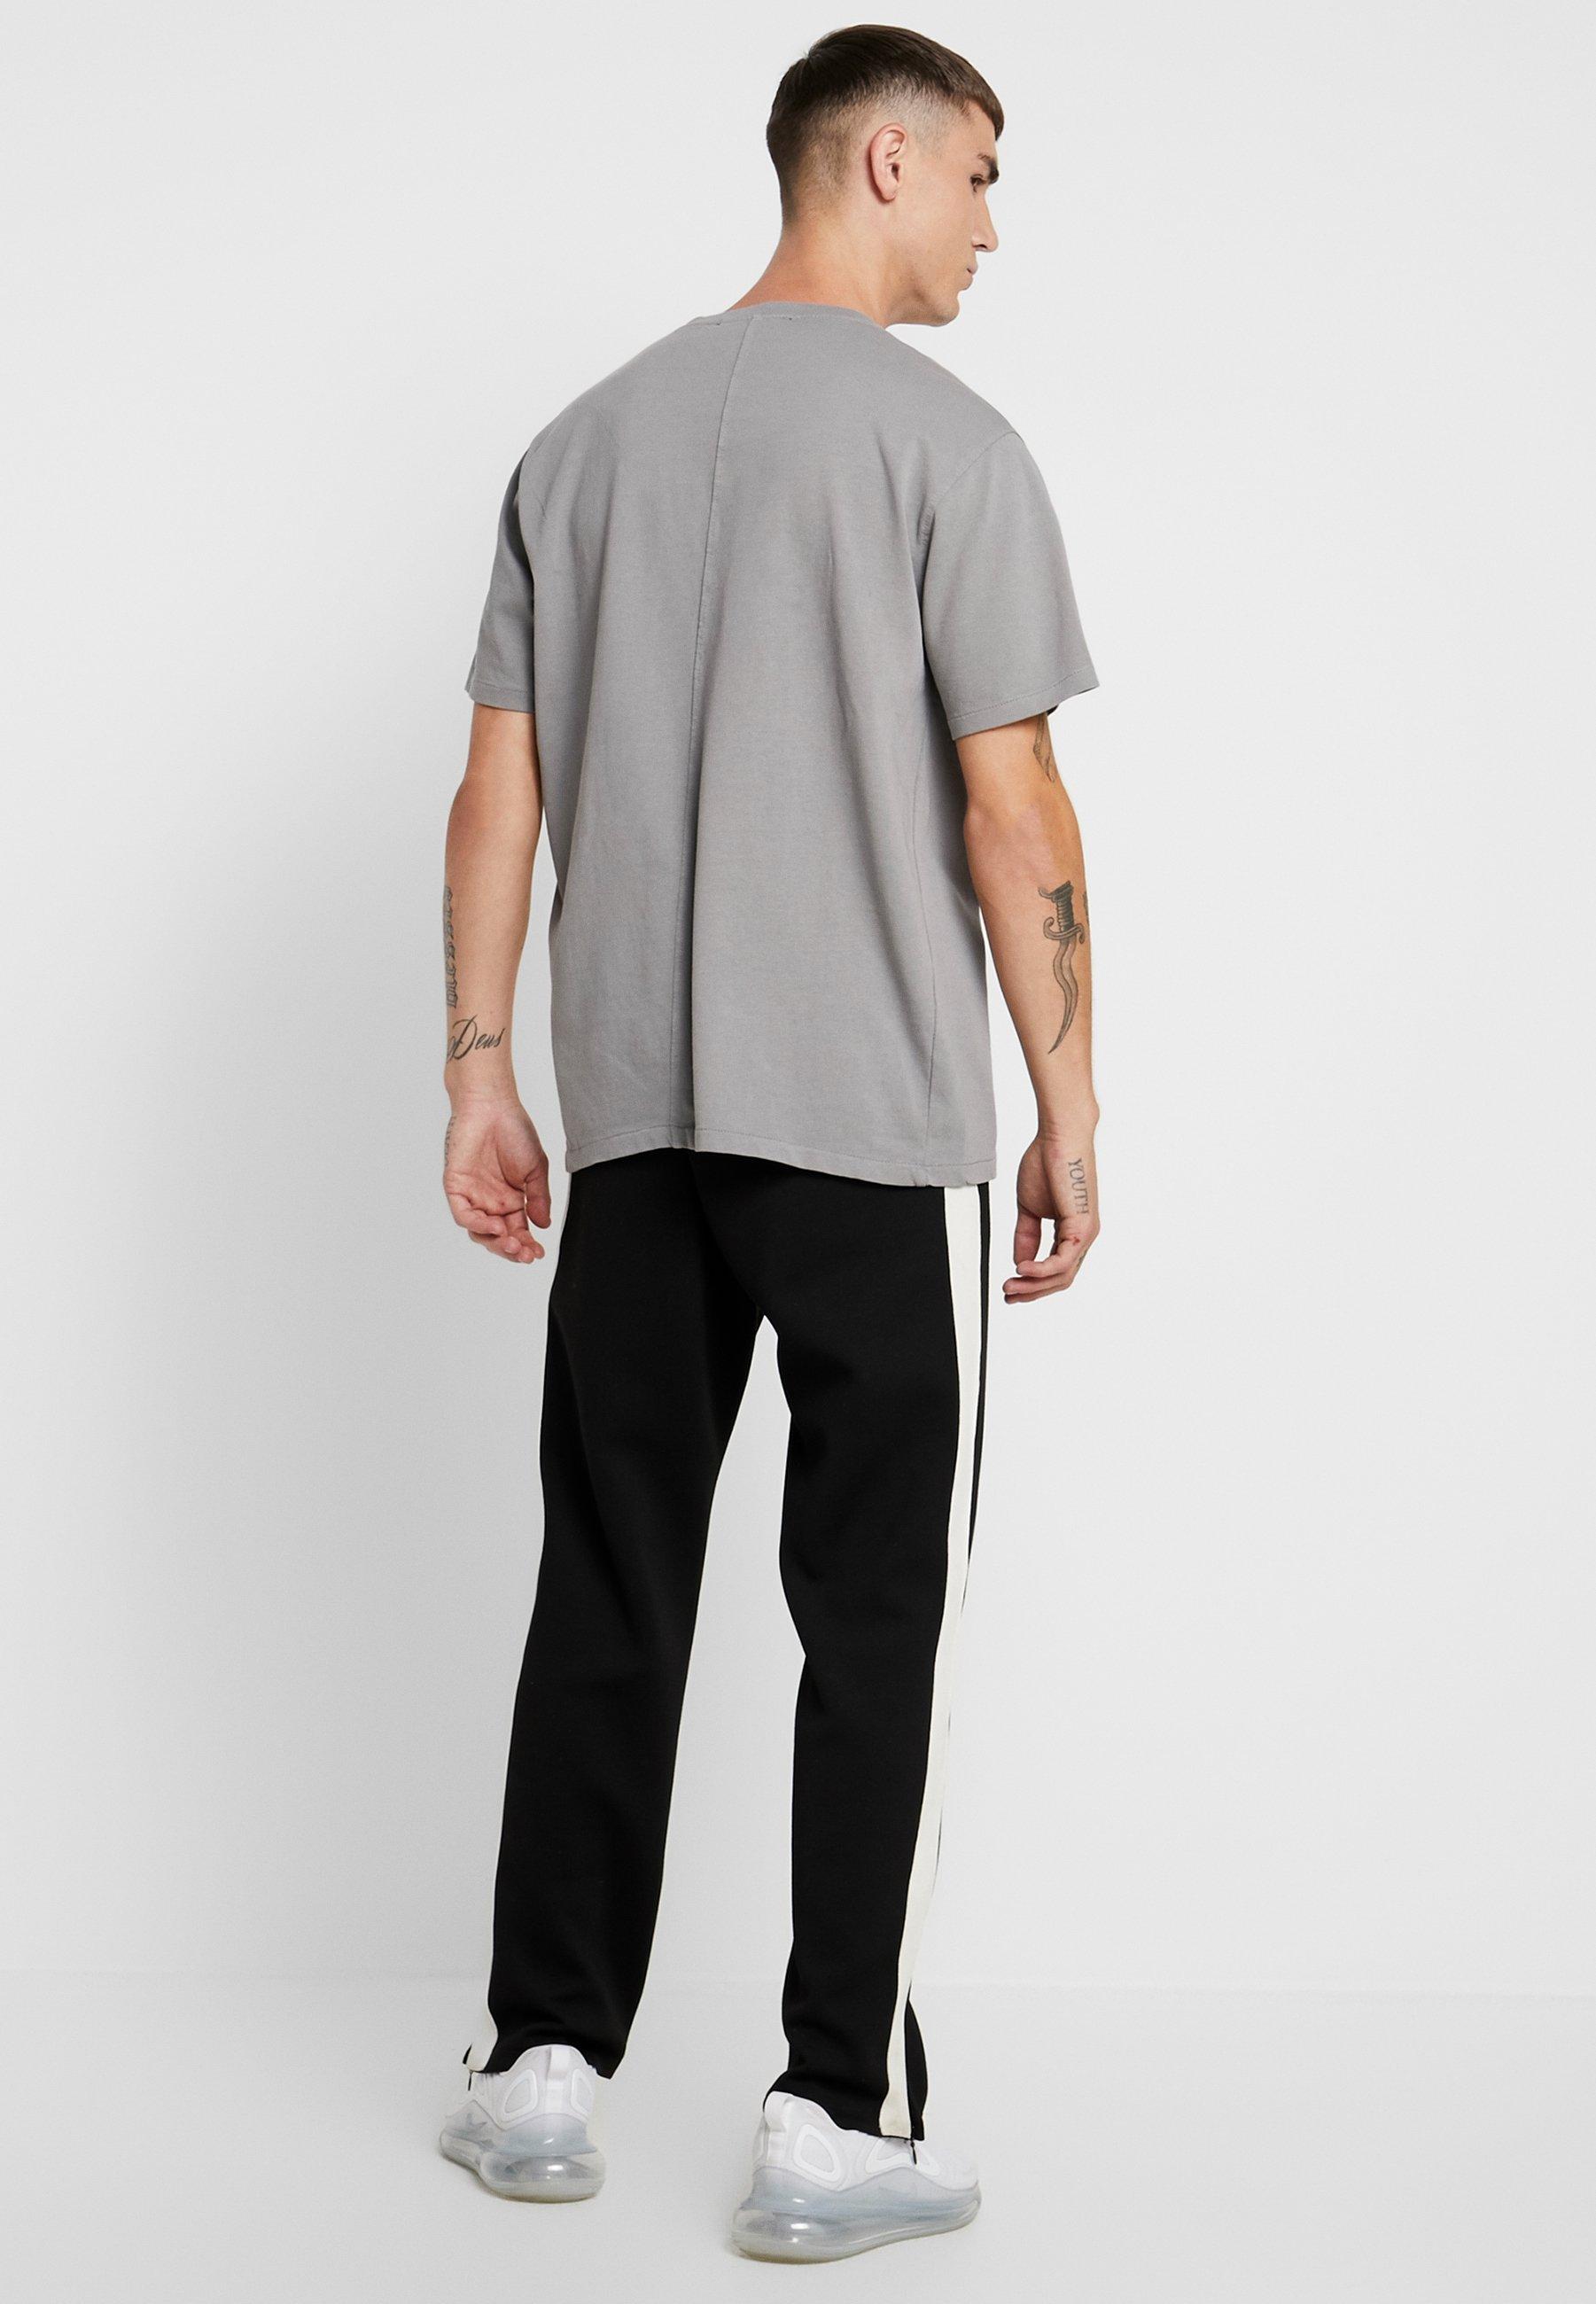 Mennace 2 grey PackT shirt Imprimé Black uOkXiPZT